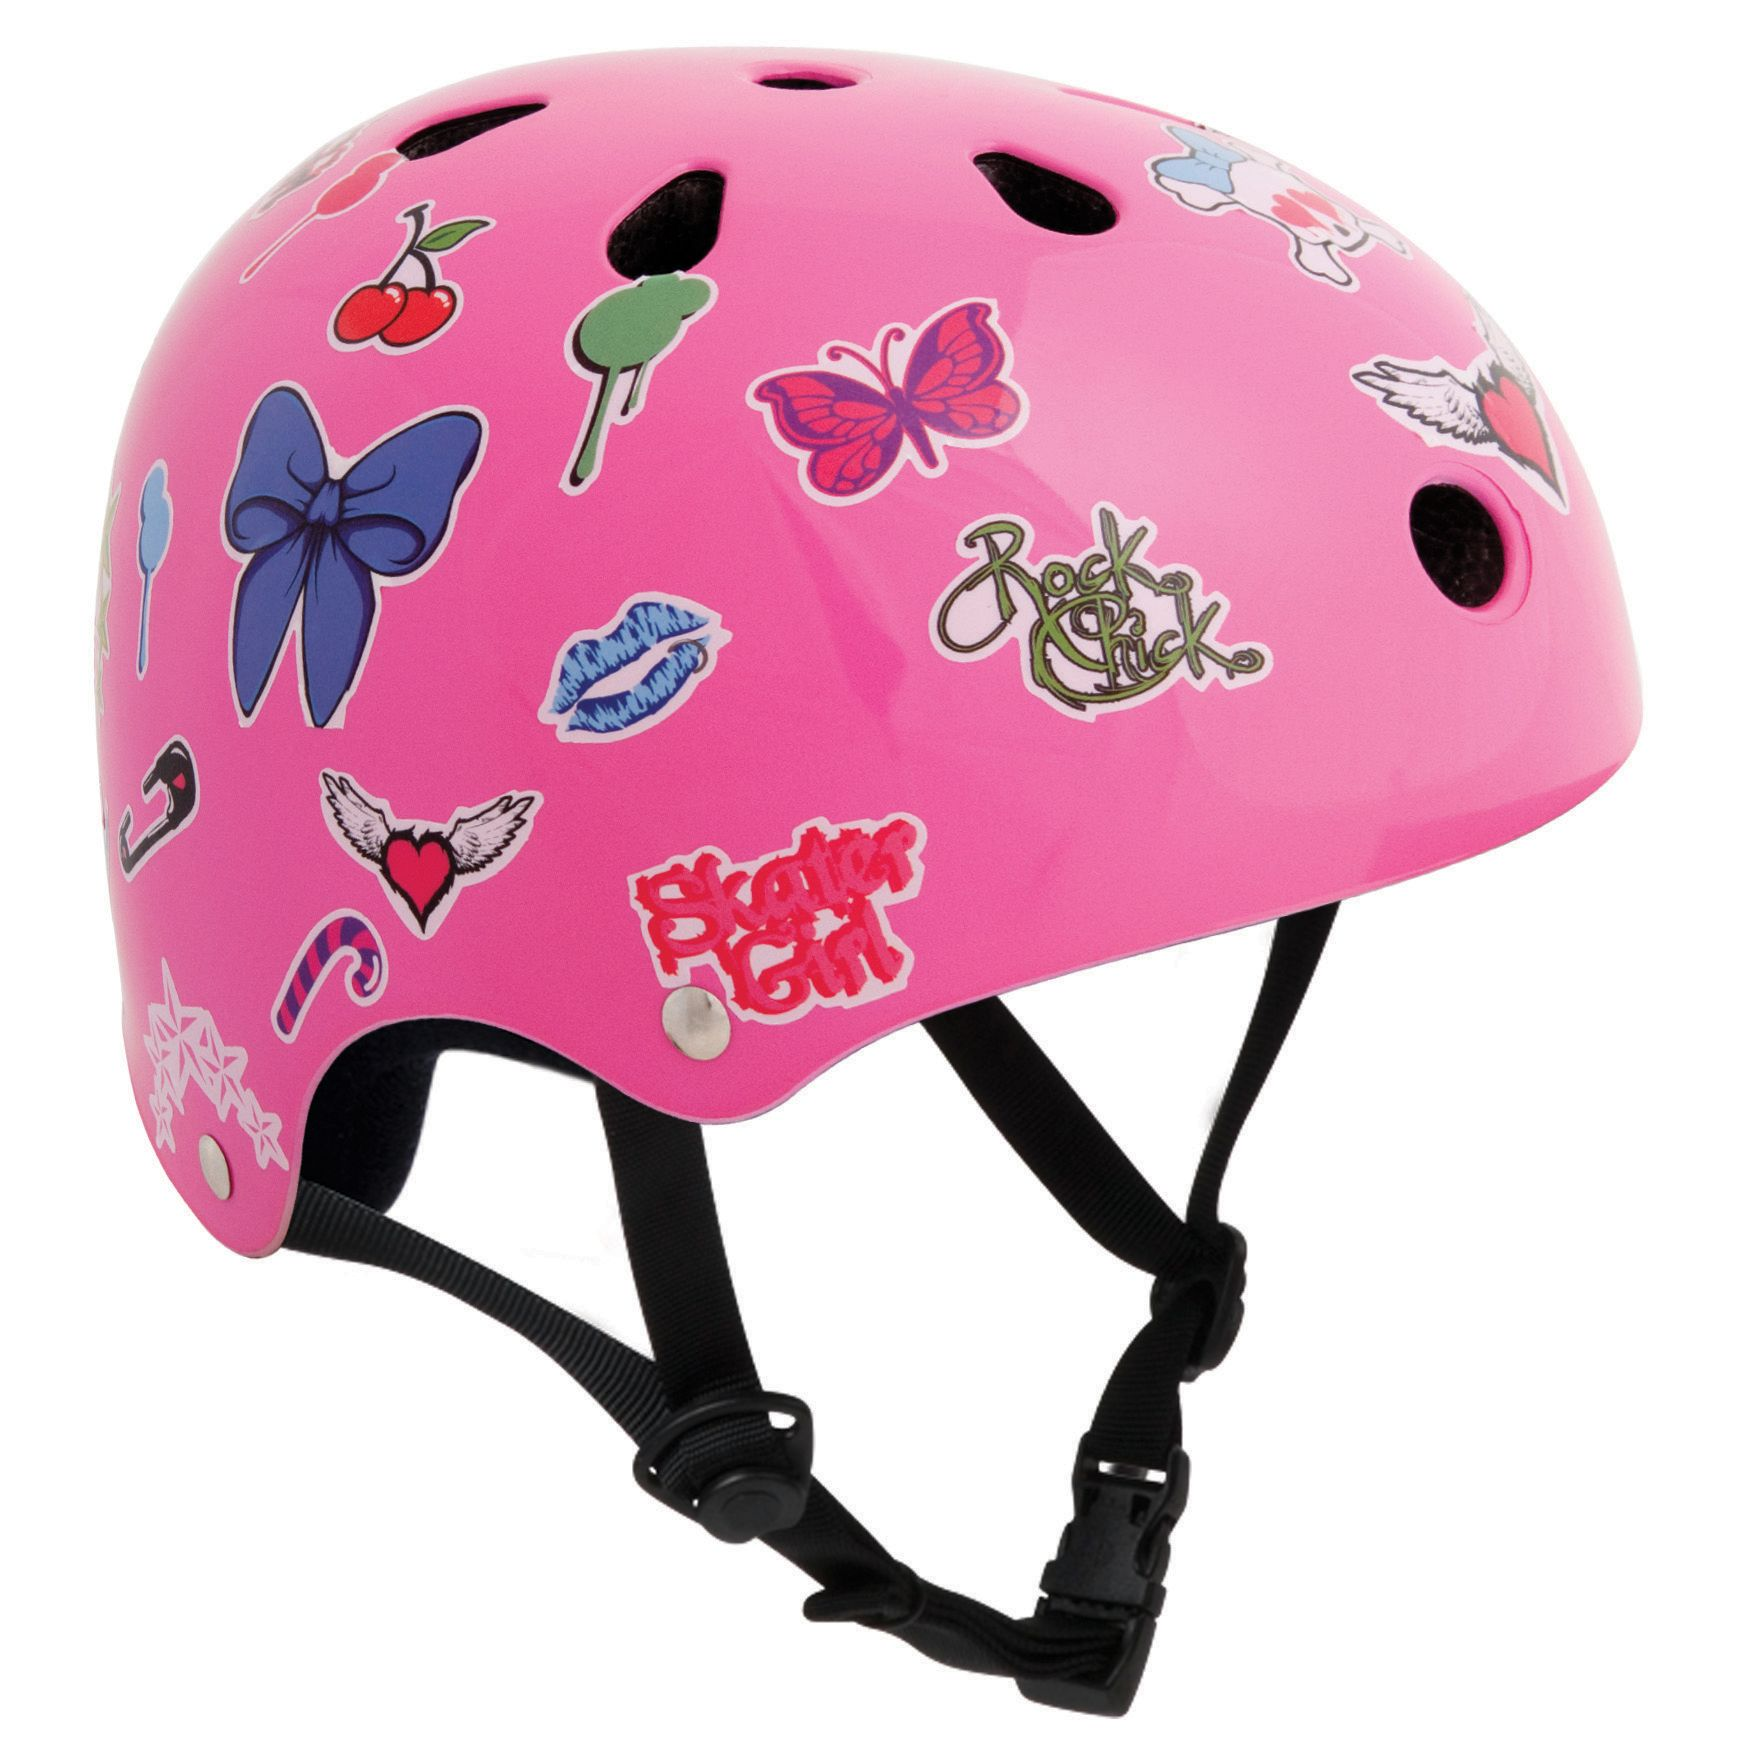 Stateside Skates Stickered Helmet, Pink